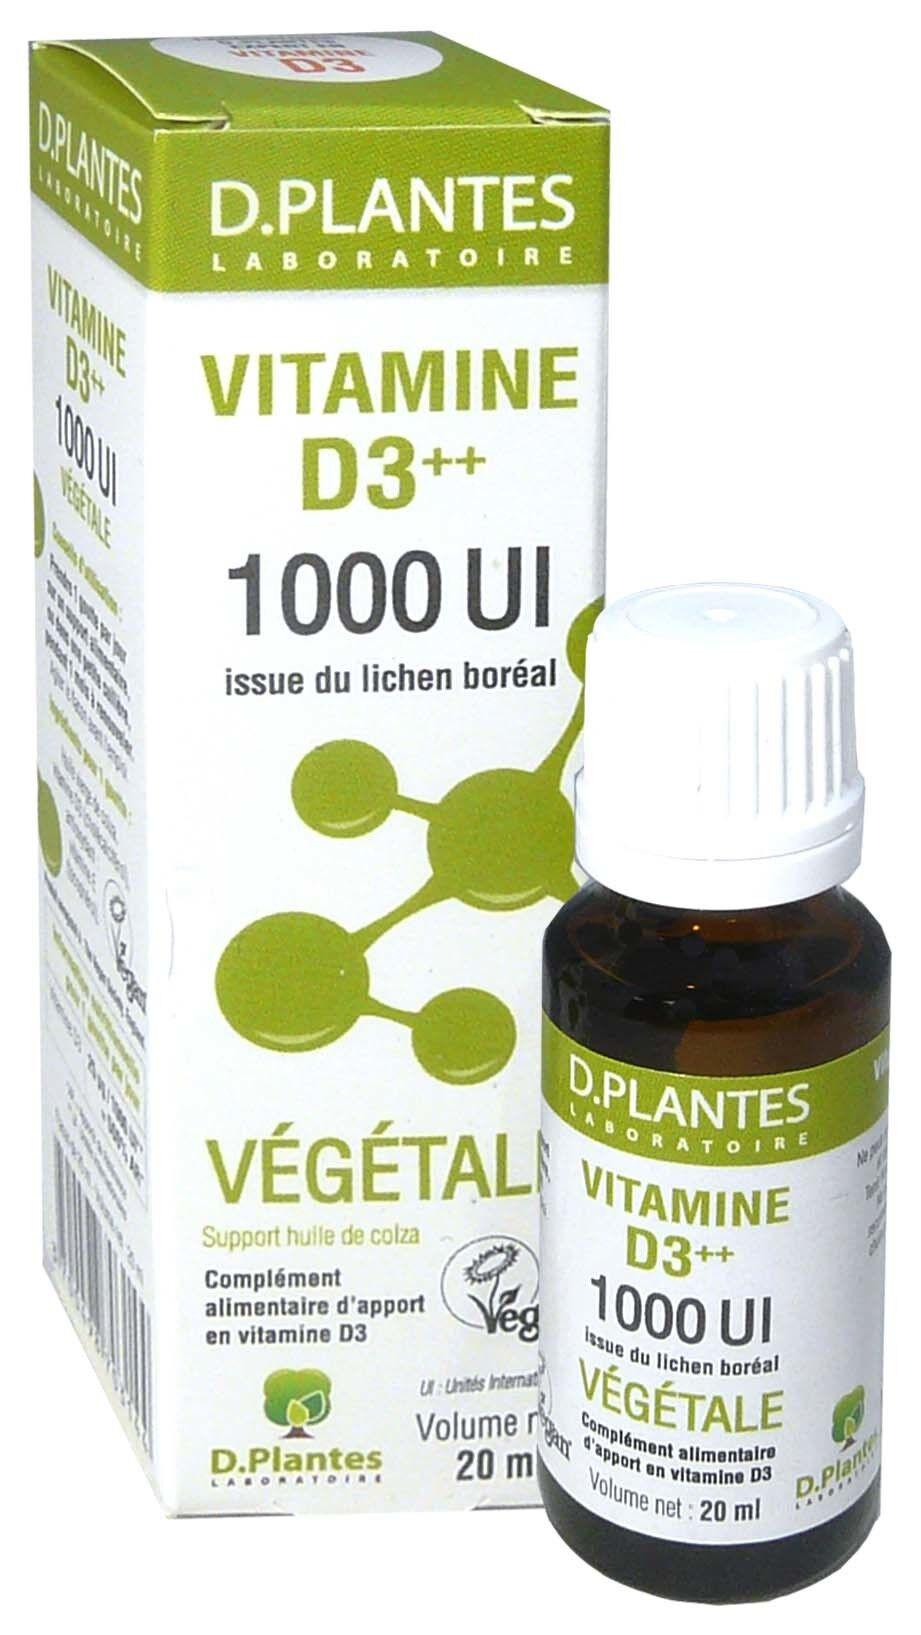 D. PLANTES D-plantes vitamine d3 vegetale 1000ul 20ml